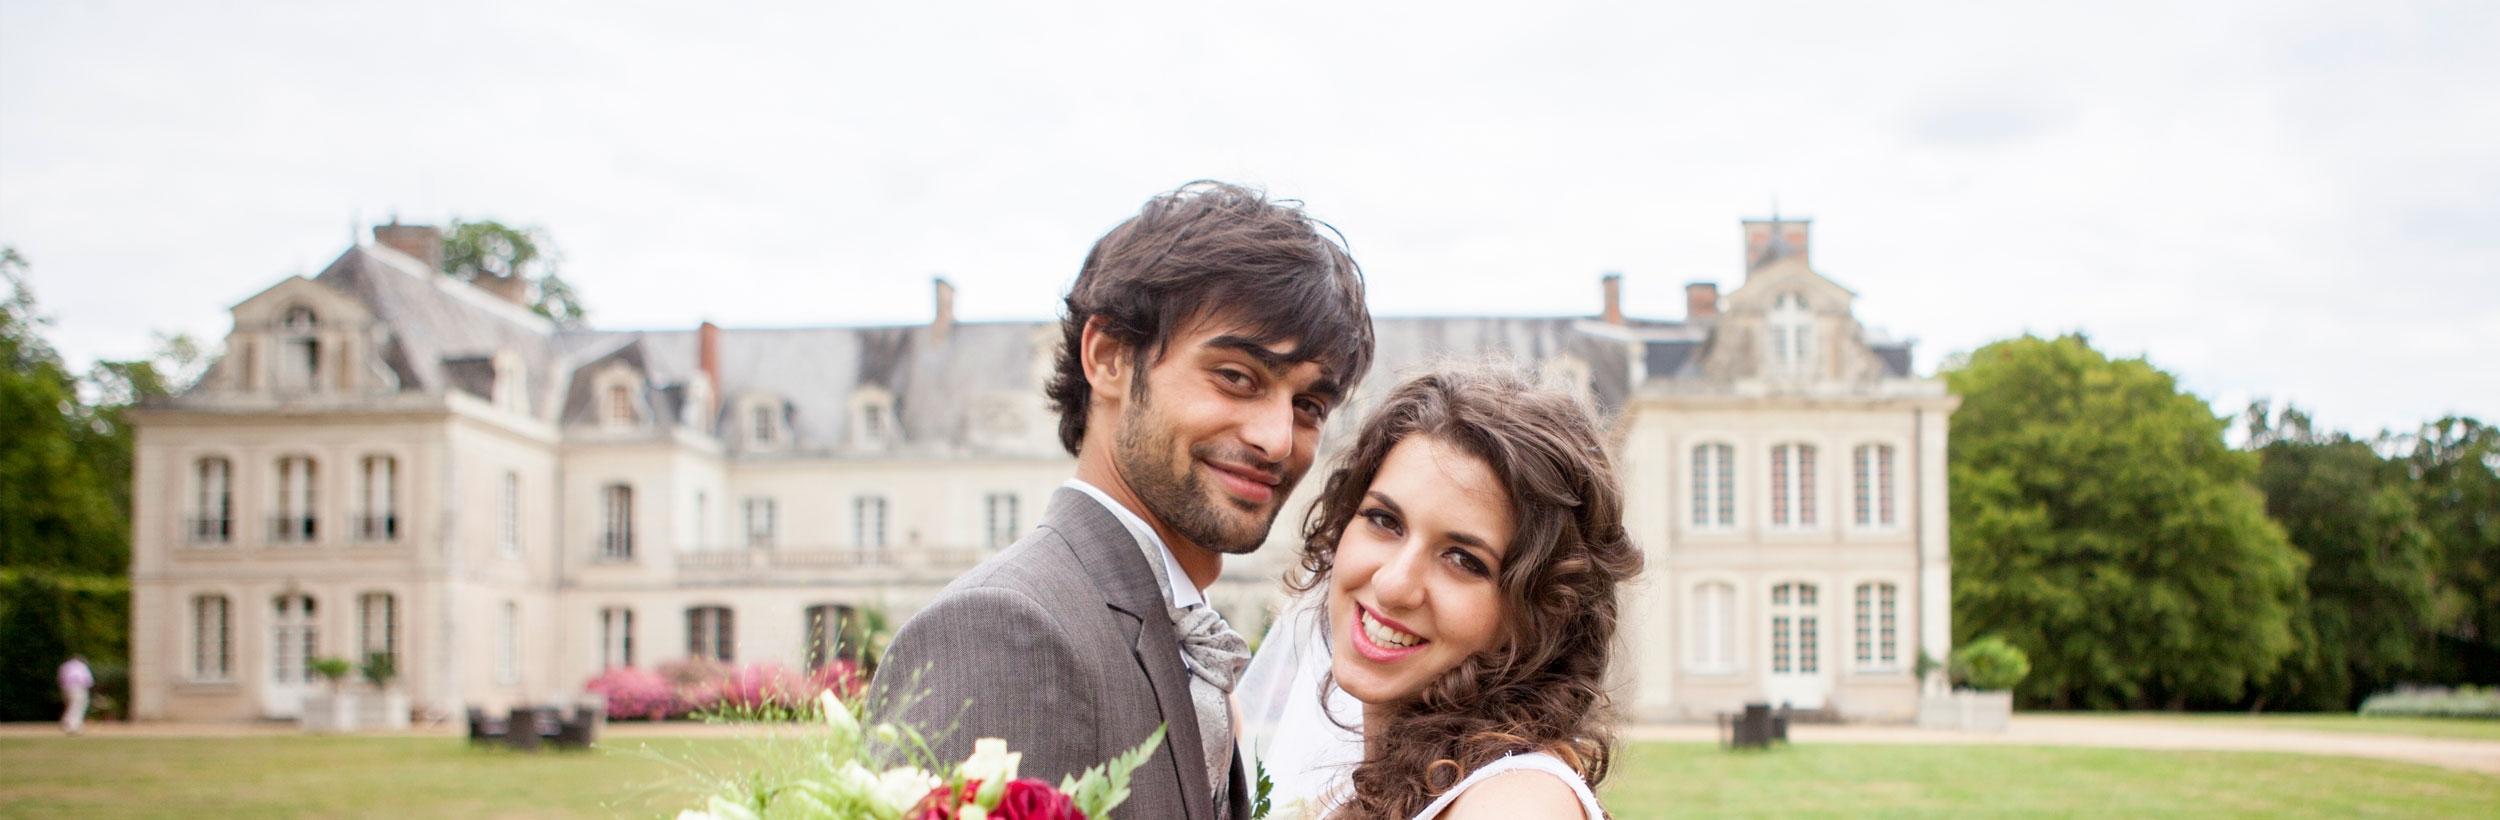 particuliers-evenements-mariage-oui-agnes&louis-pagetop